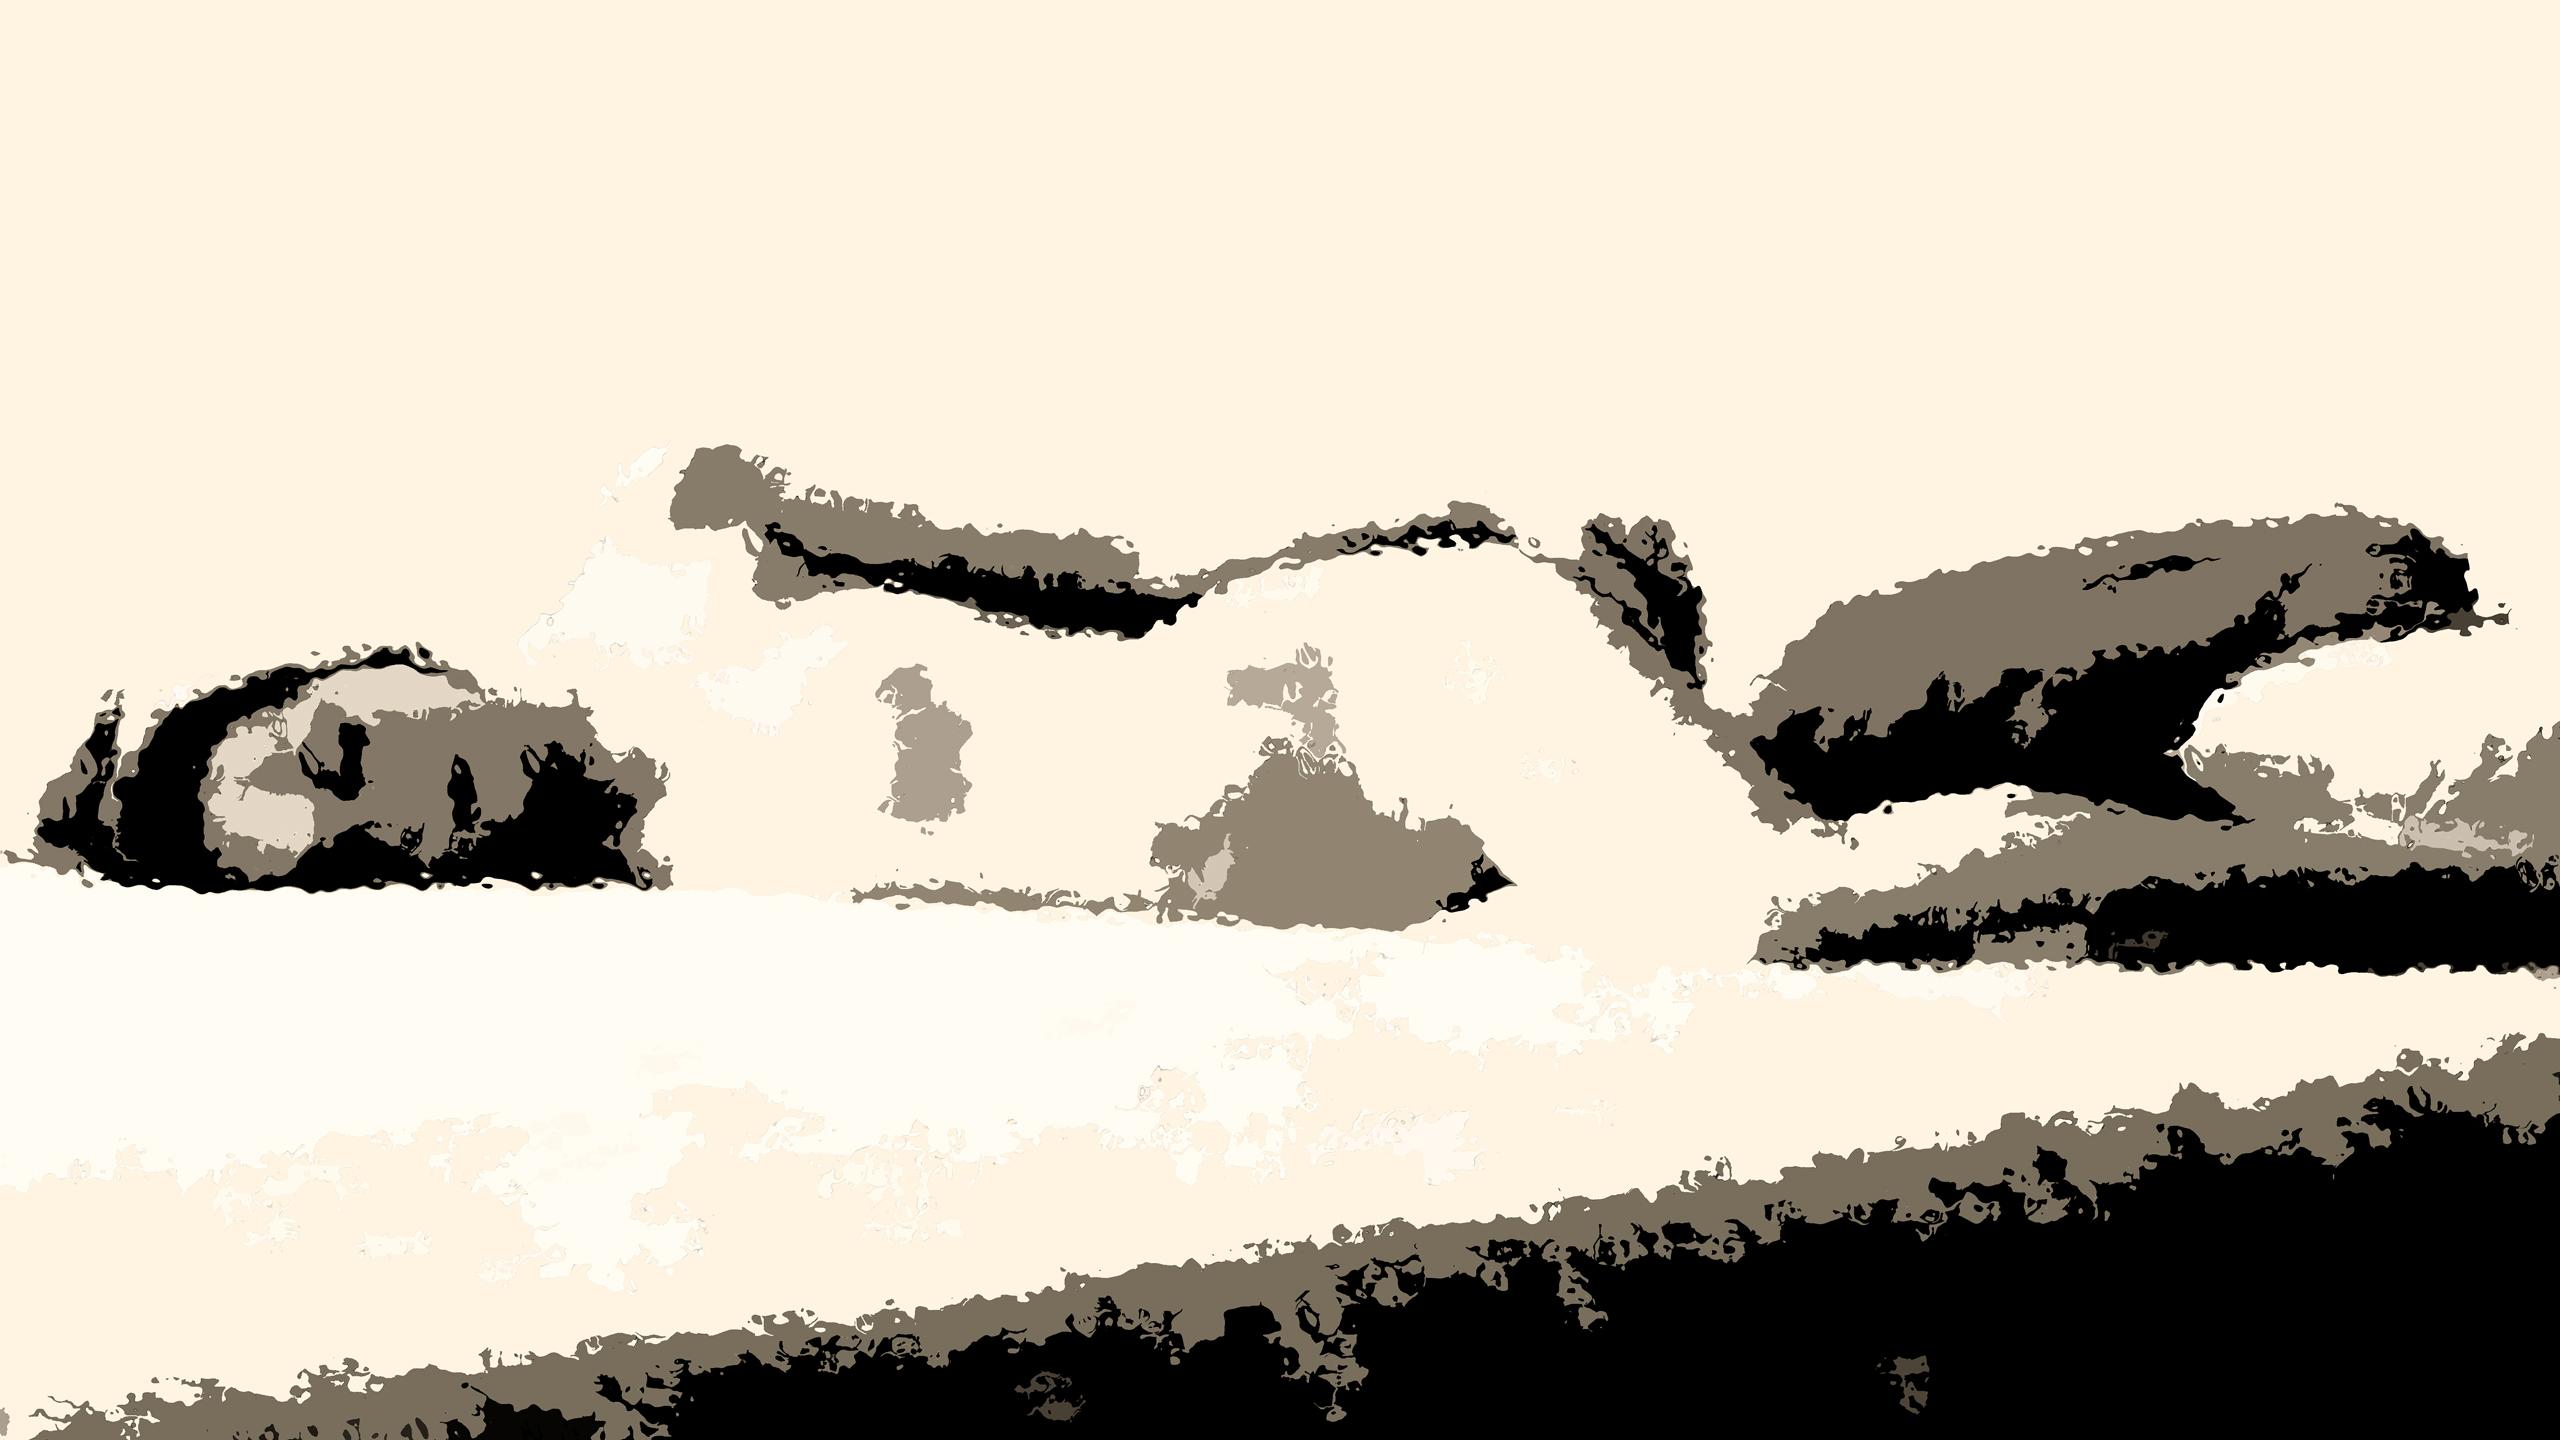 Cándida duerme / Kopi Luwak